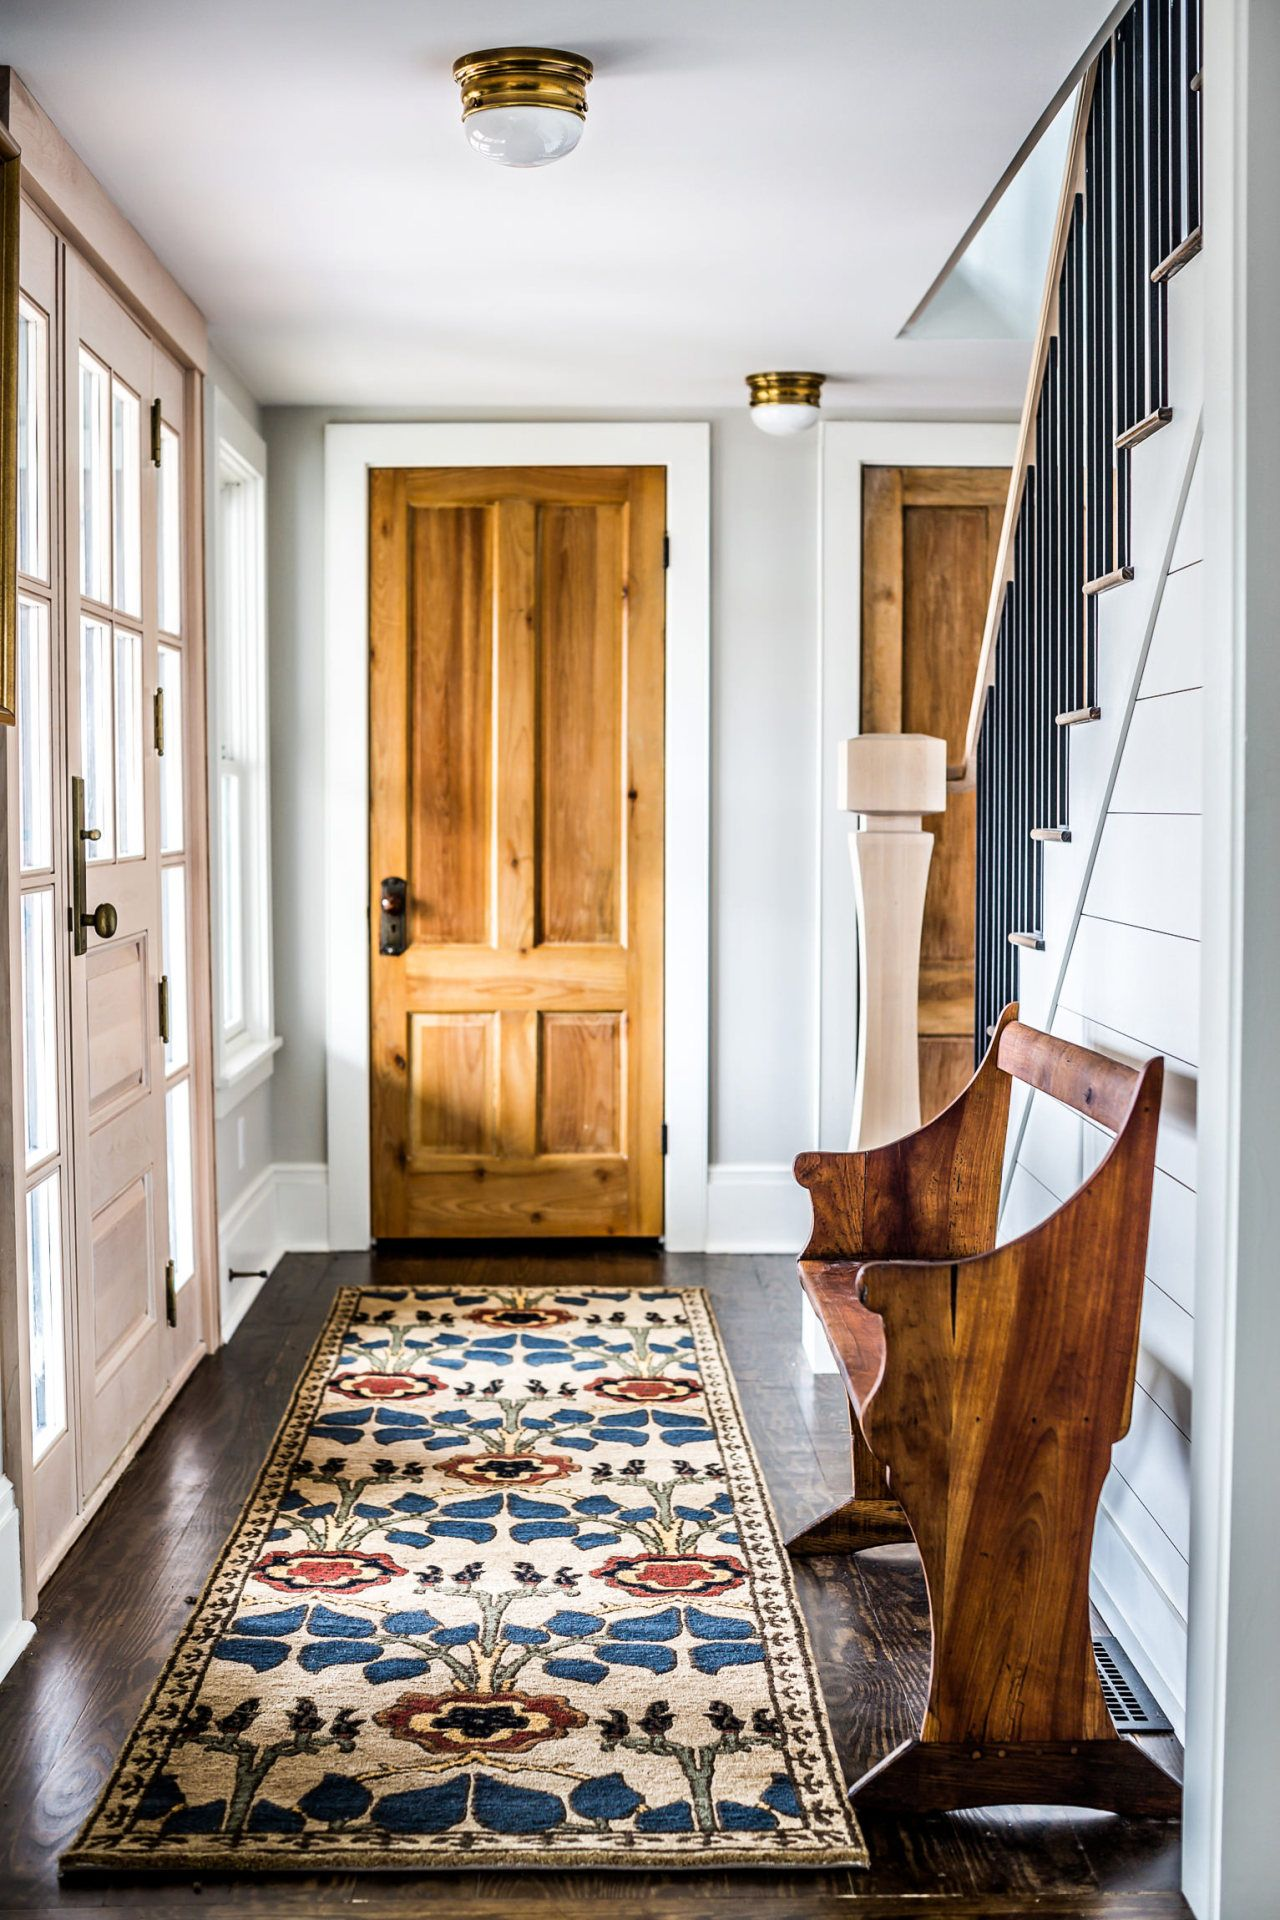 Fresh Farmhouse / White Walls / Wood Accents / Home Décor